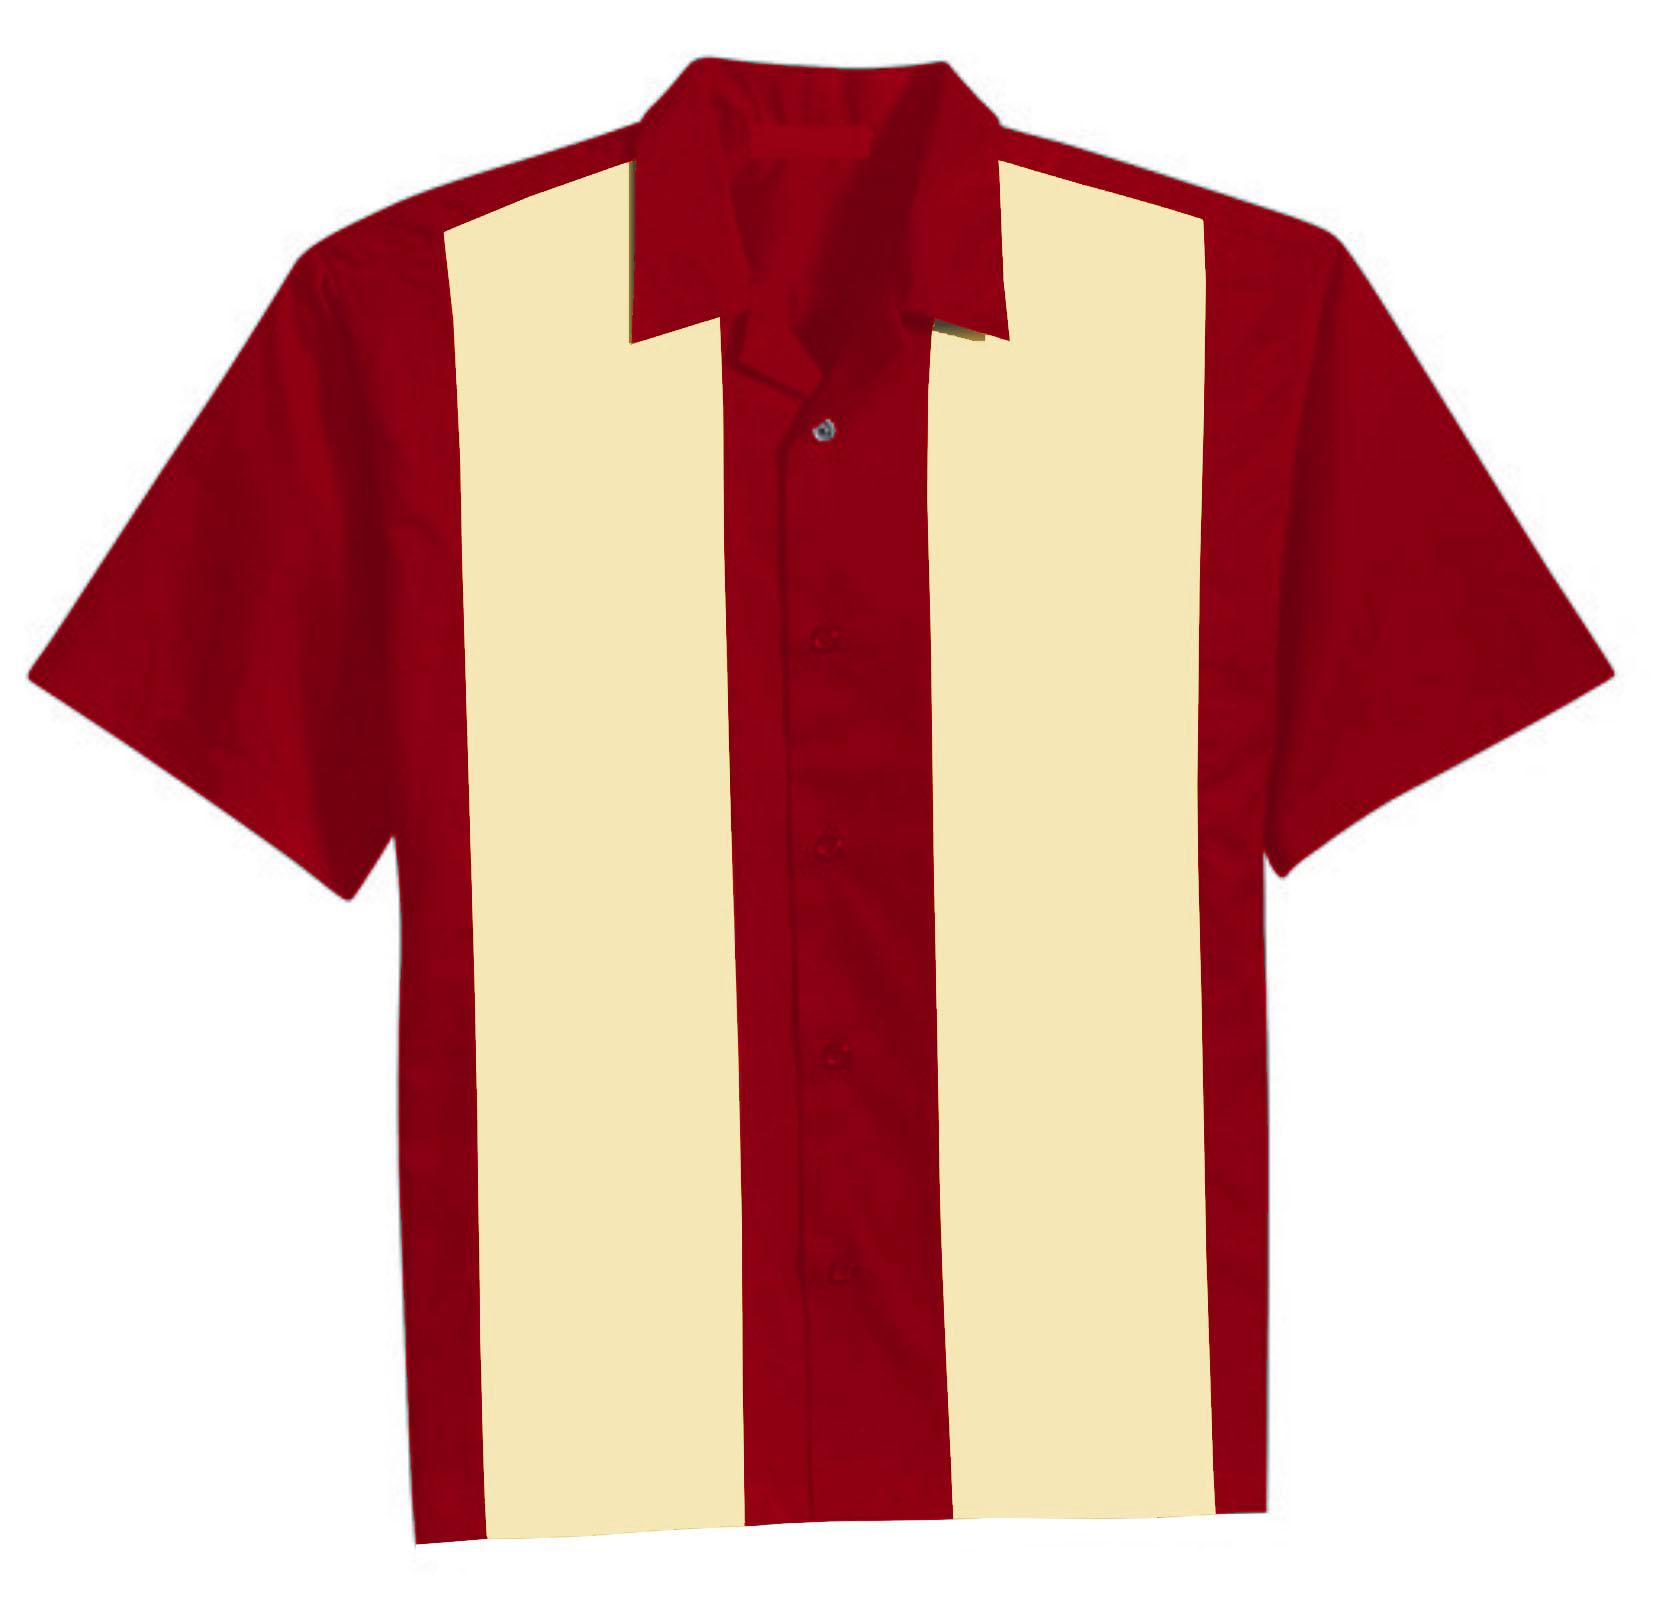 Maroon Dress Shirt For Men